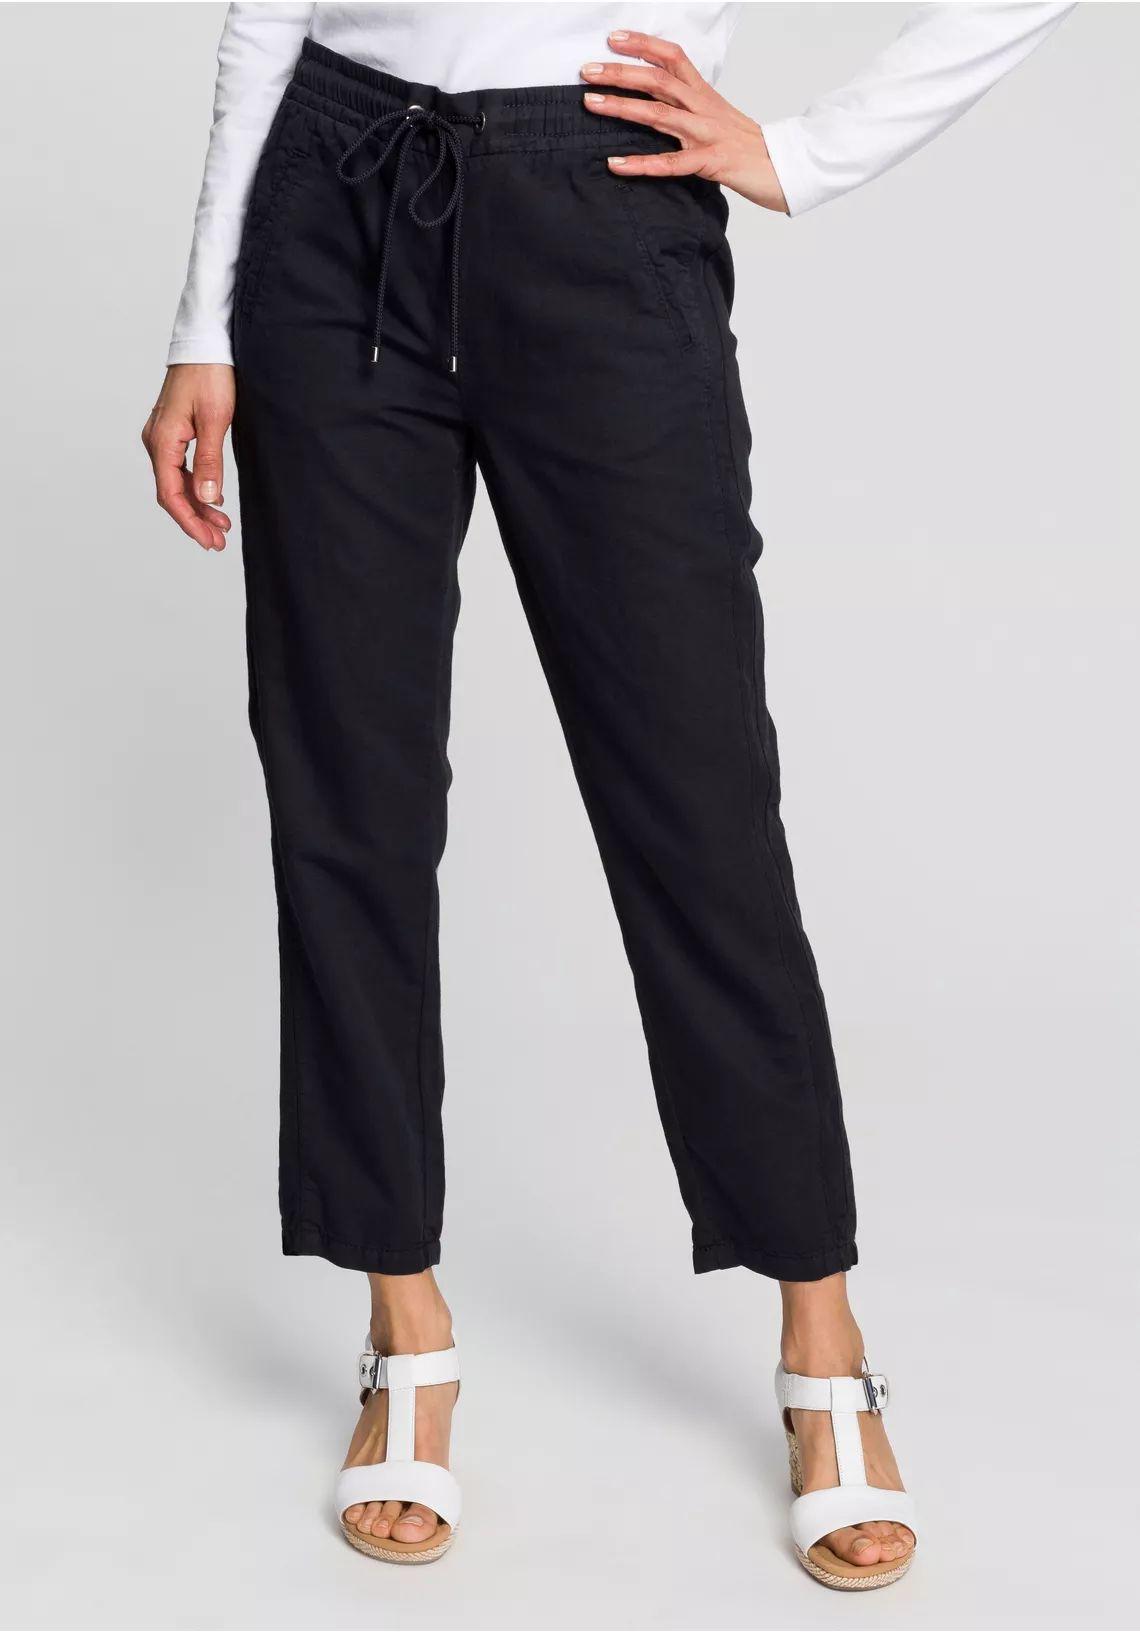 MAC Jeans dames EASY chino